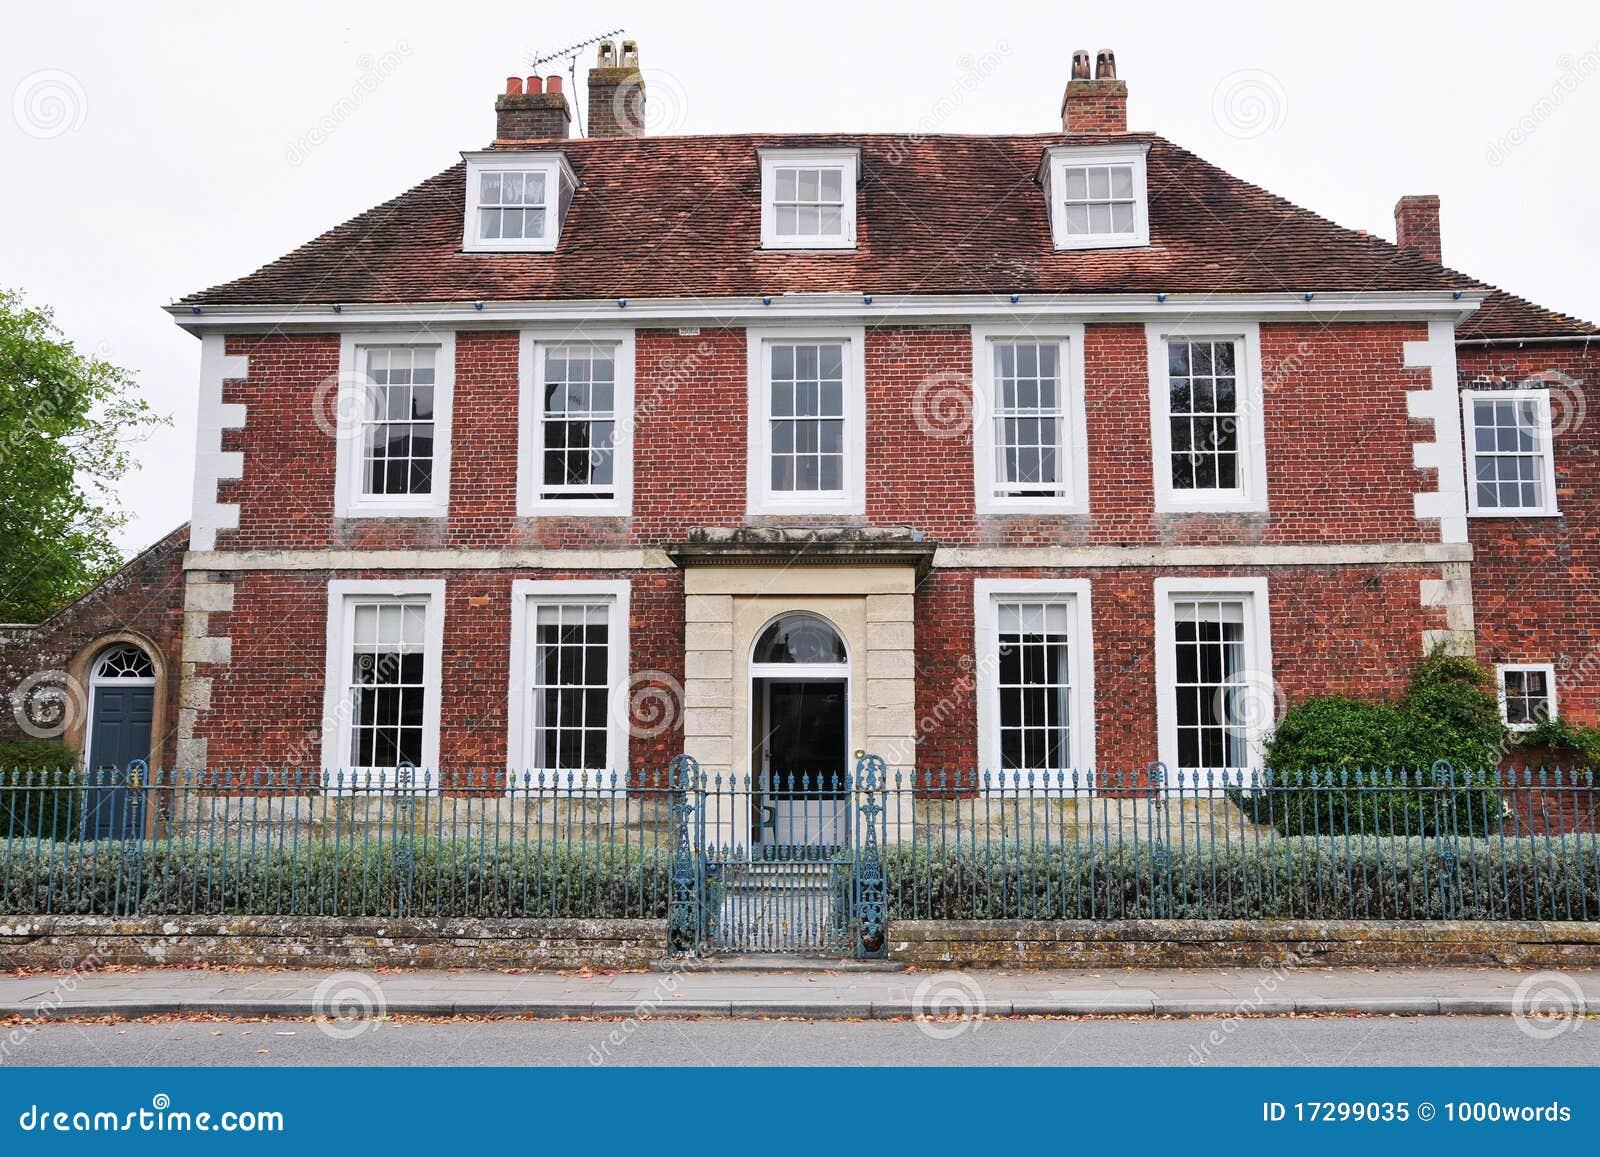 Roter Ziegelstein Haus Lizenzfreies Stockfoto Bild 17299035